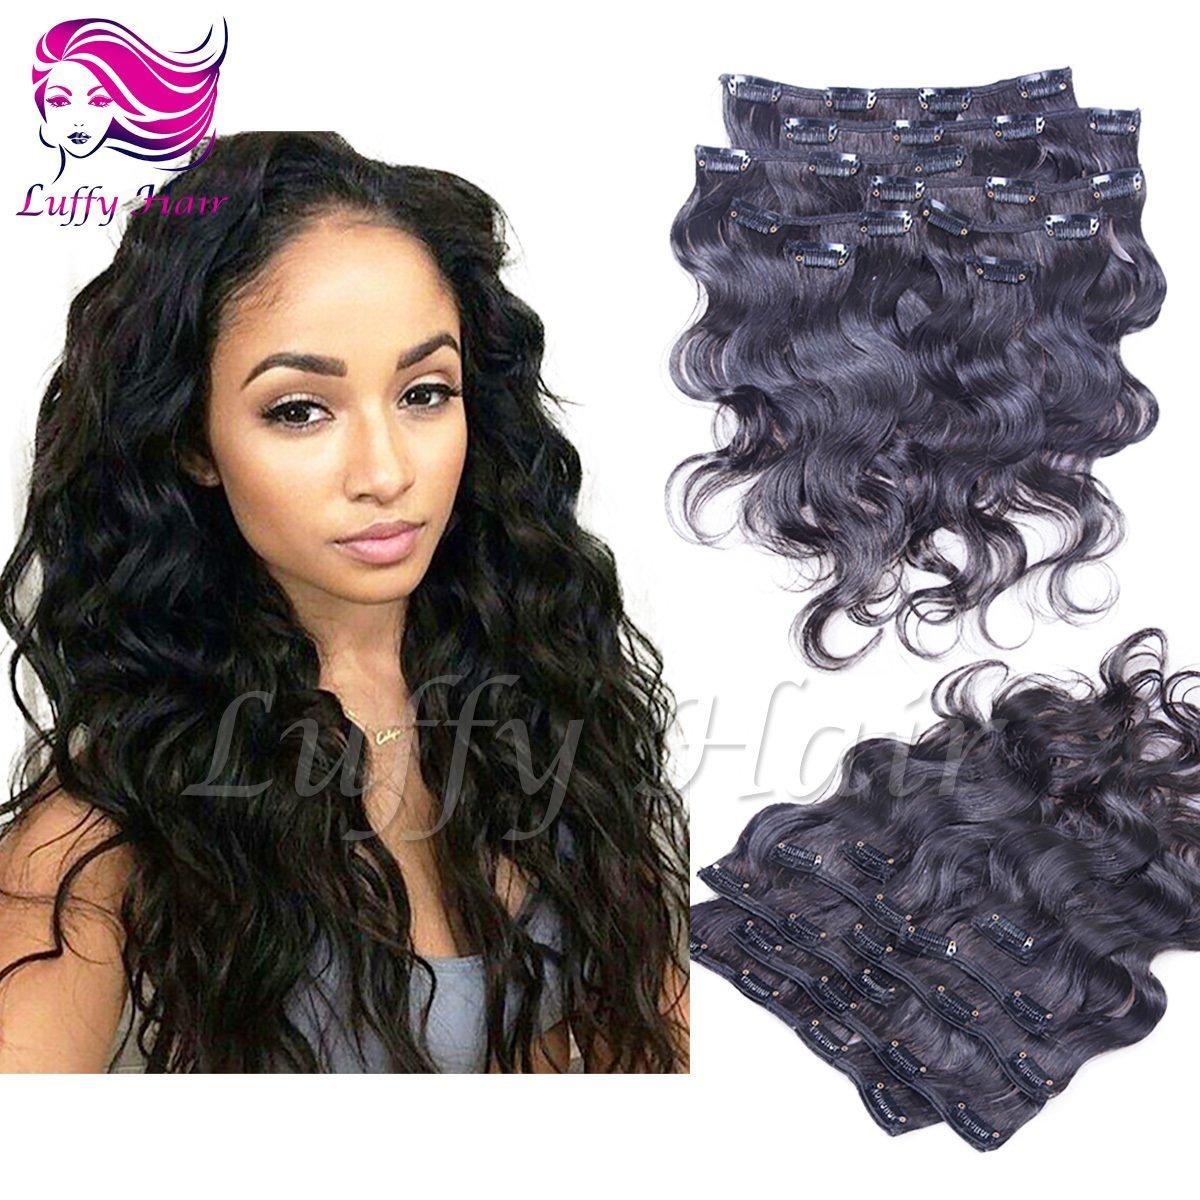 8A Virgin Human Hair Body Wave Clip In Hair Extensions - KIL005